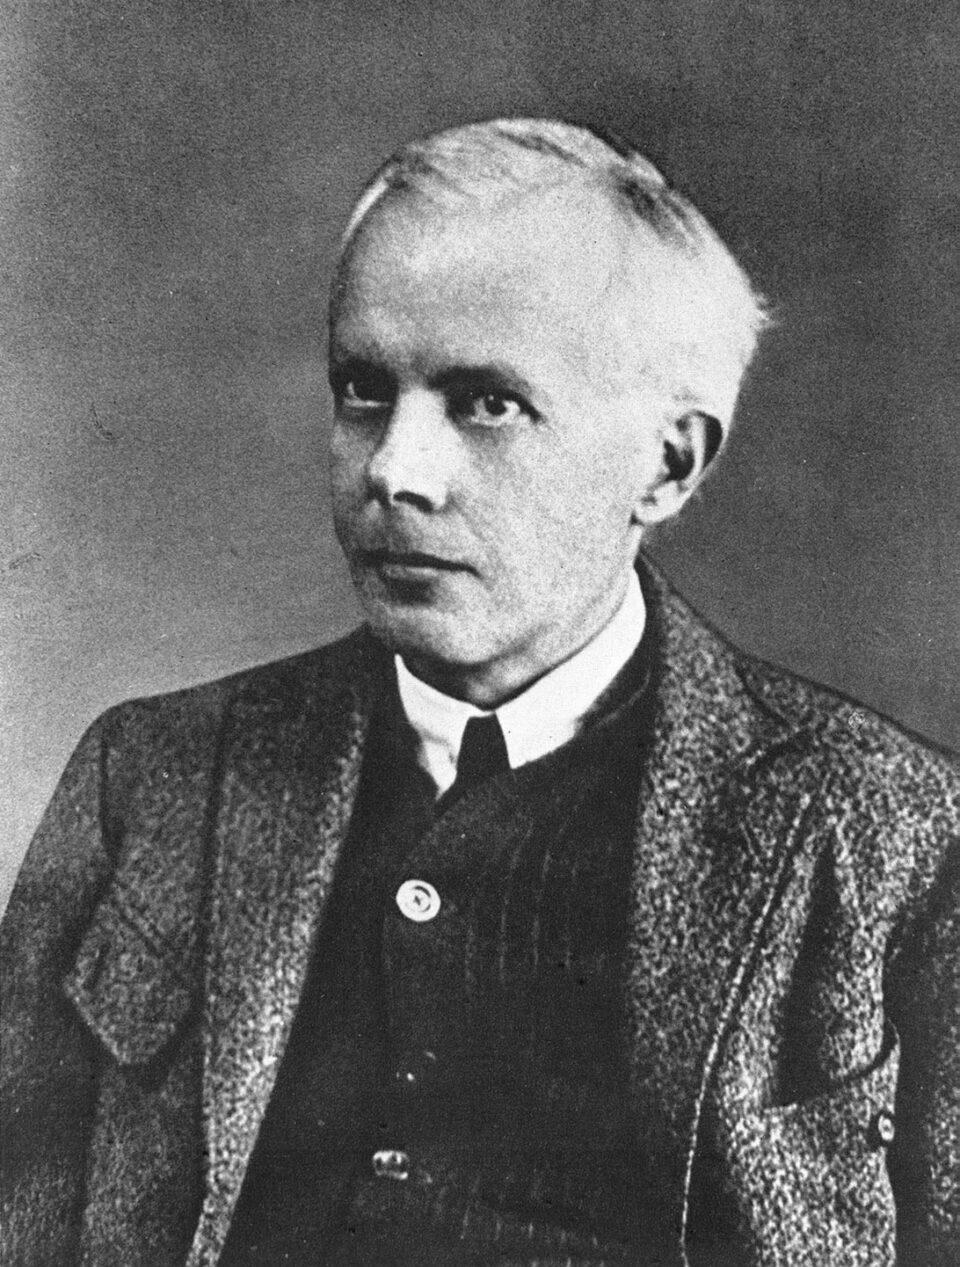 Béla Bartók (1881-1945): Quartetos Nº 2 a 4 (Tátrai) #BRTK140 Vol. 8 de 29